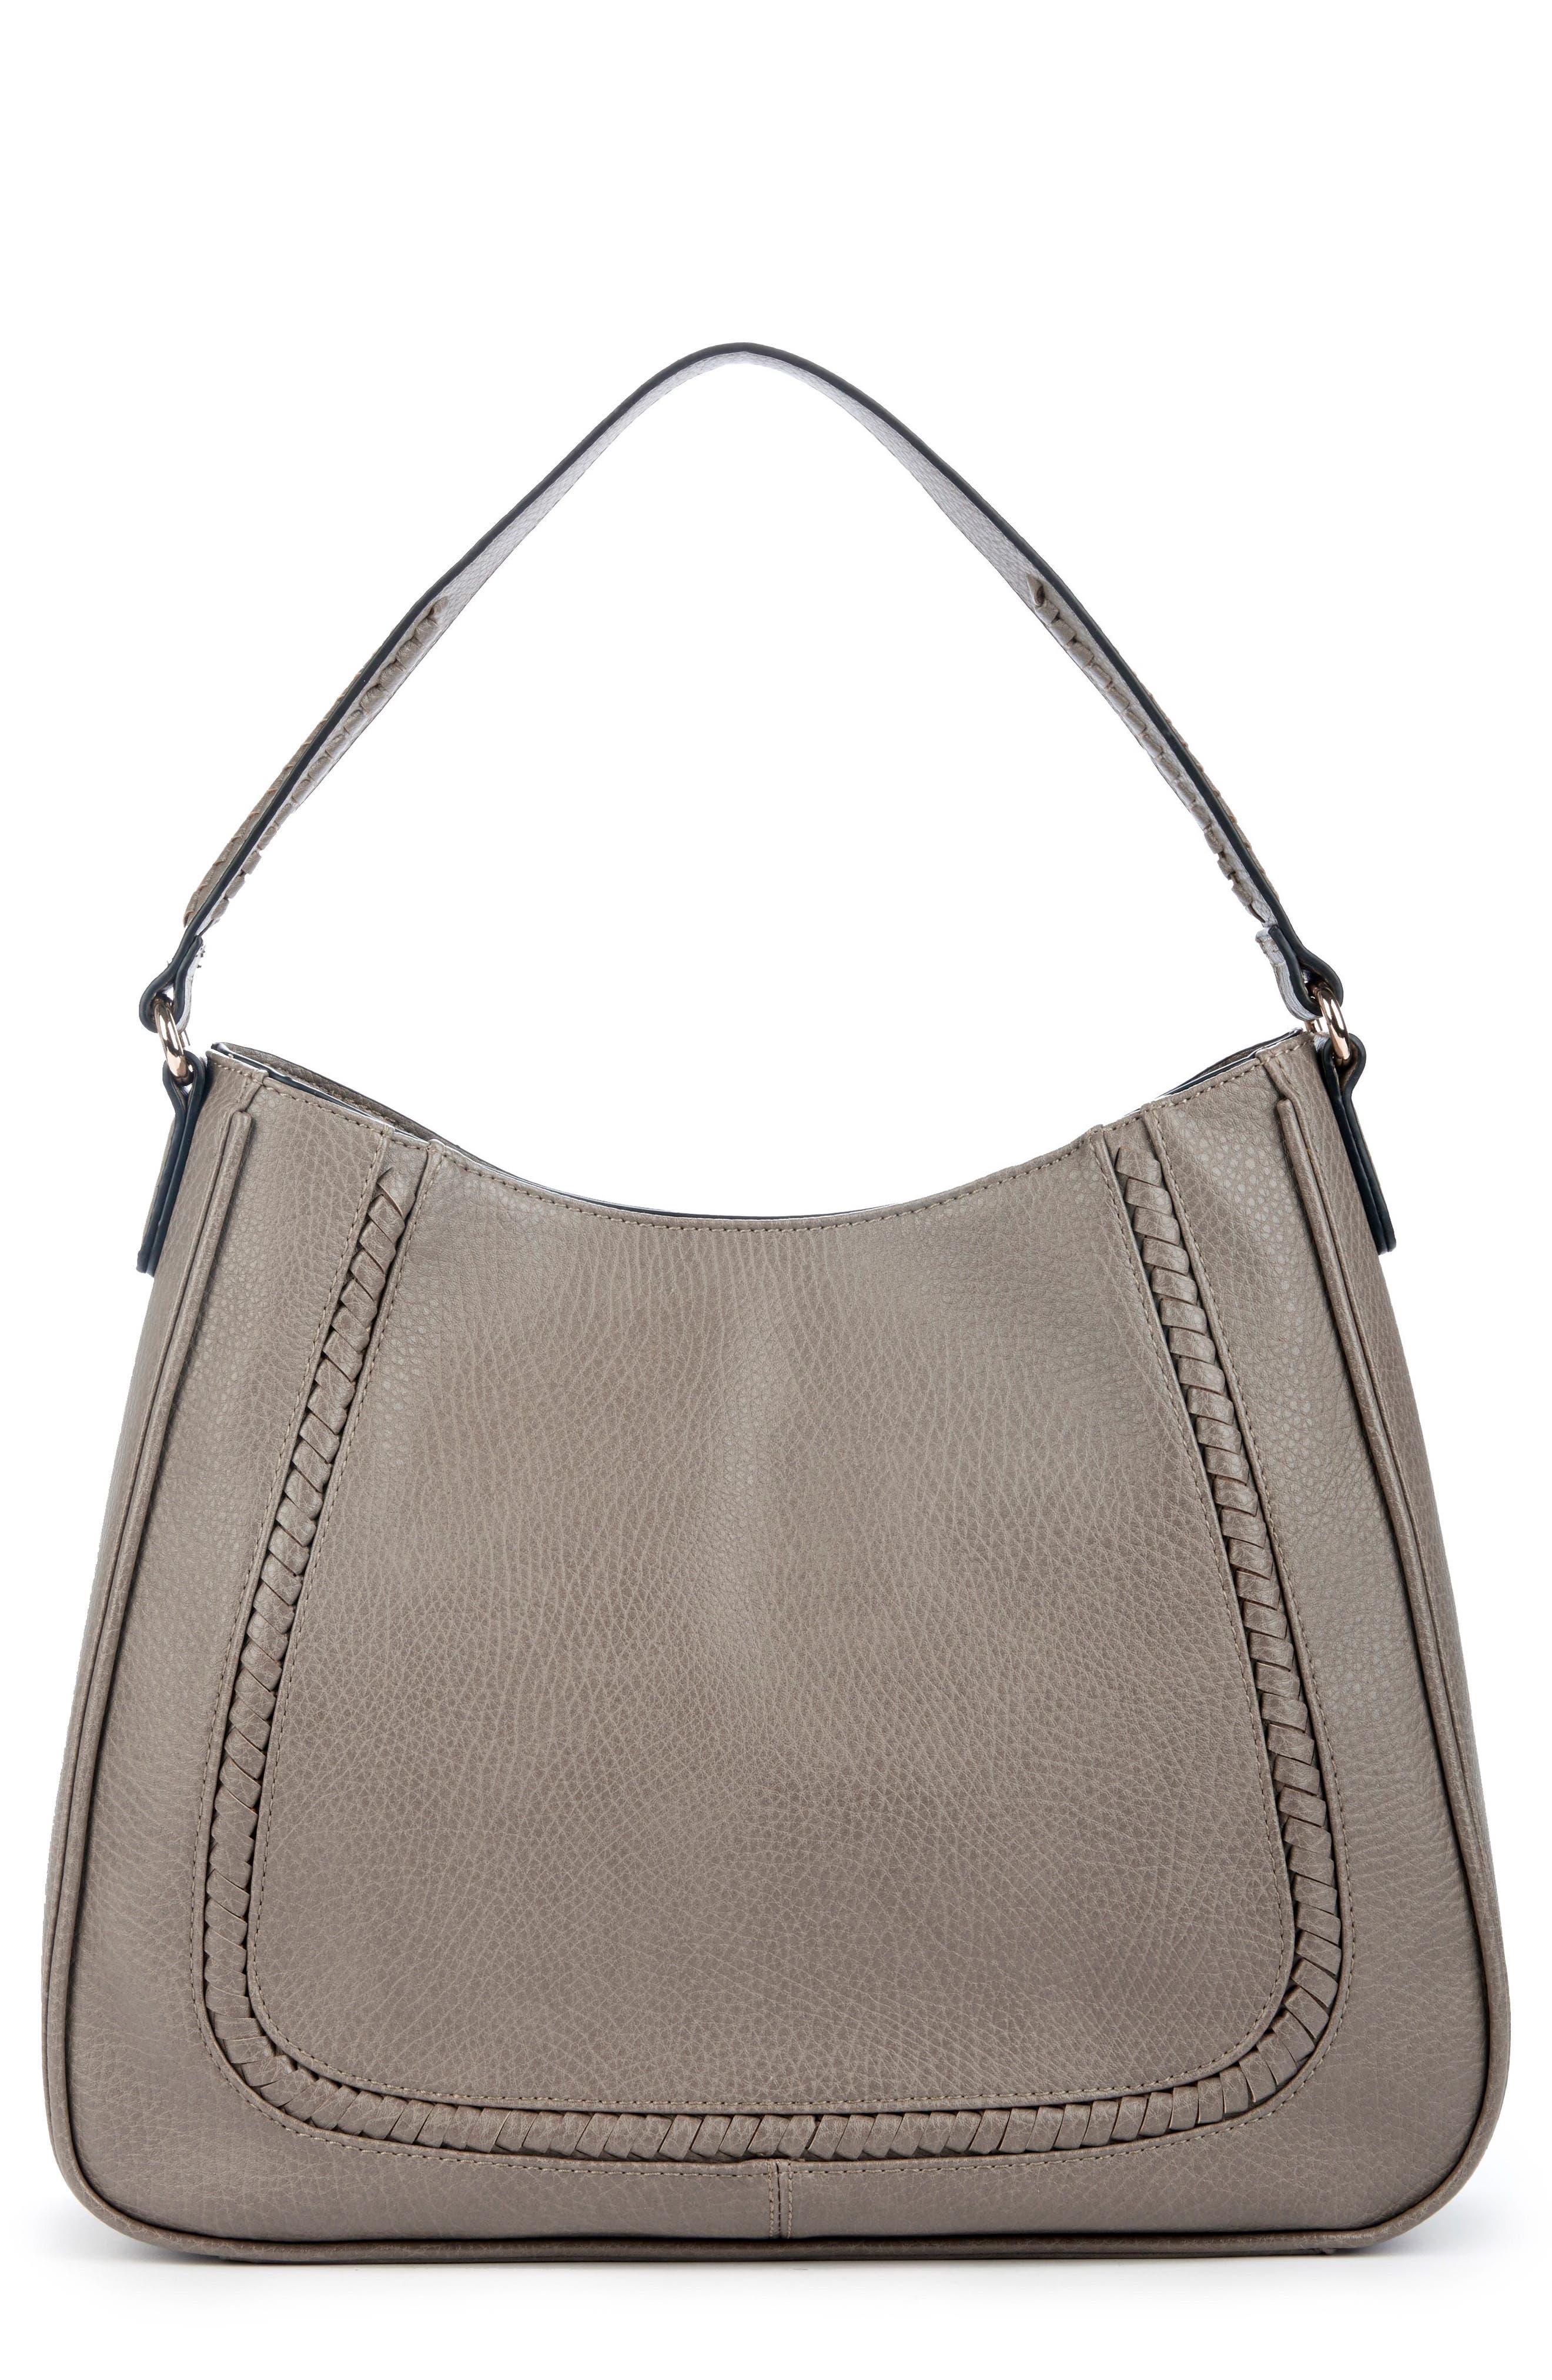 Sarafina Faux Leather Shoulder Bag,                             Main thumbnail 1, color,                             020